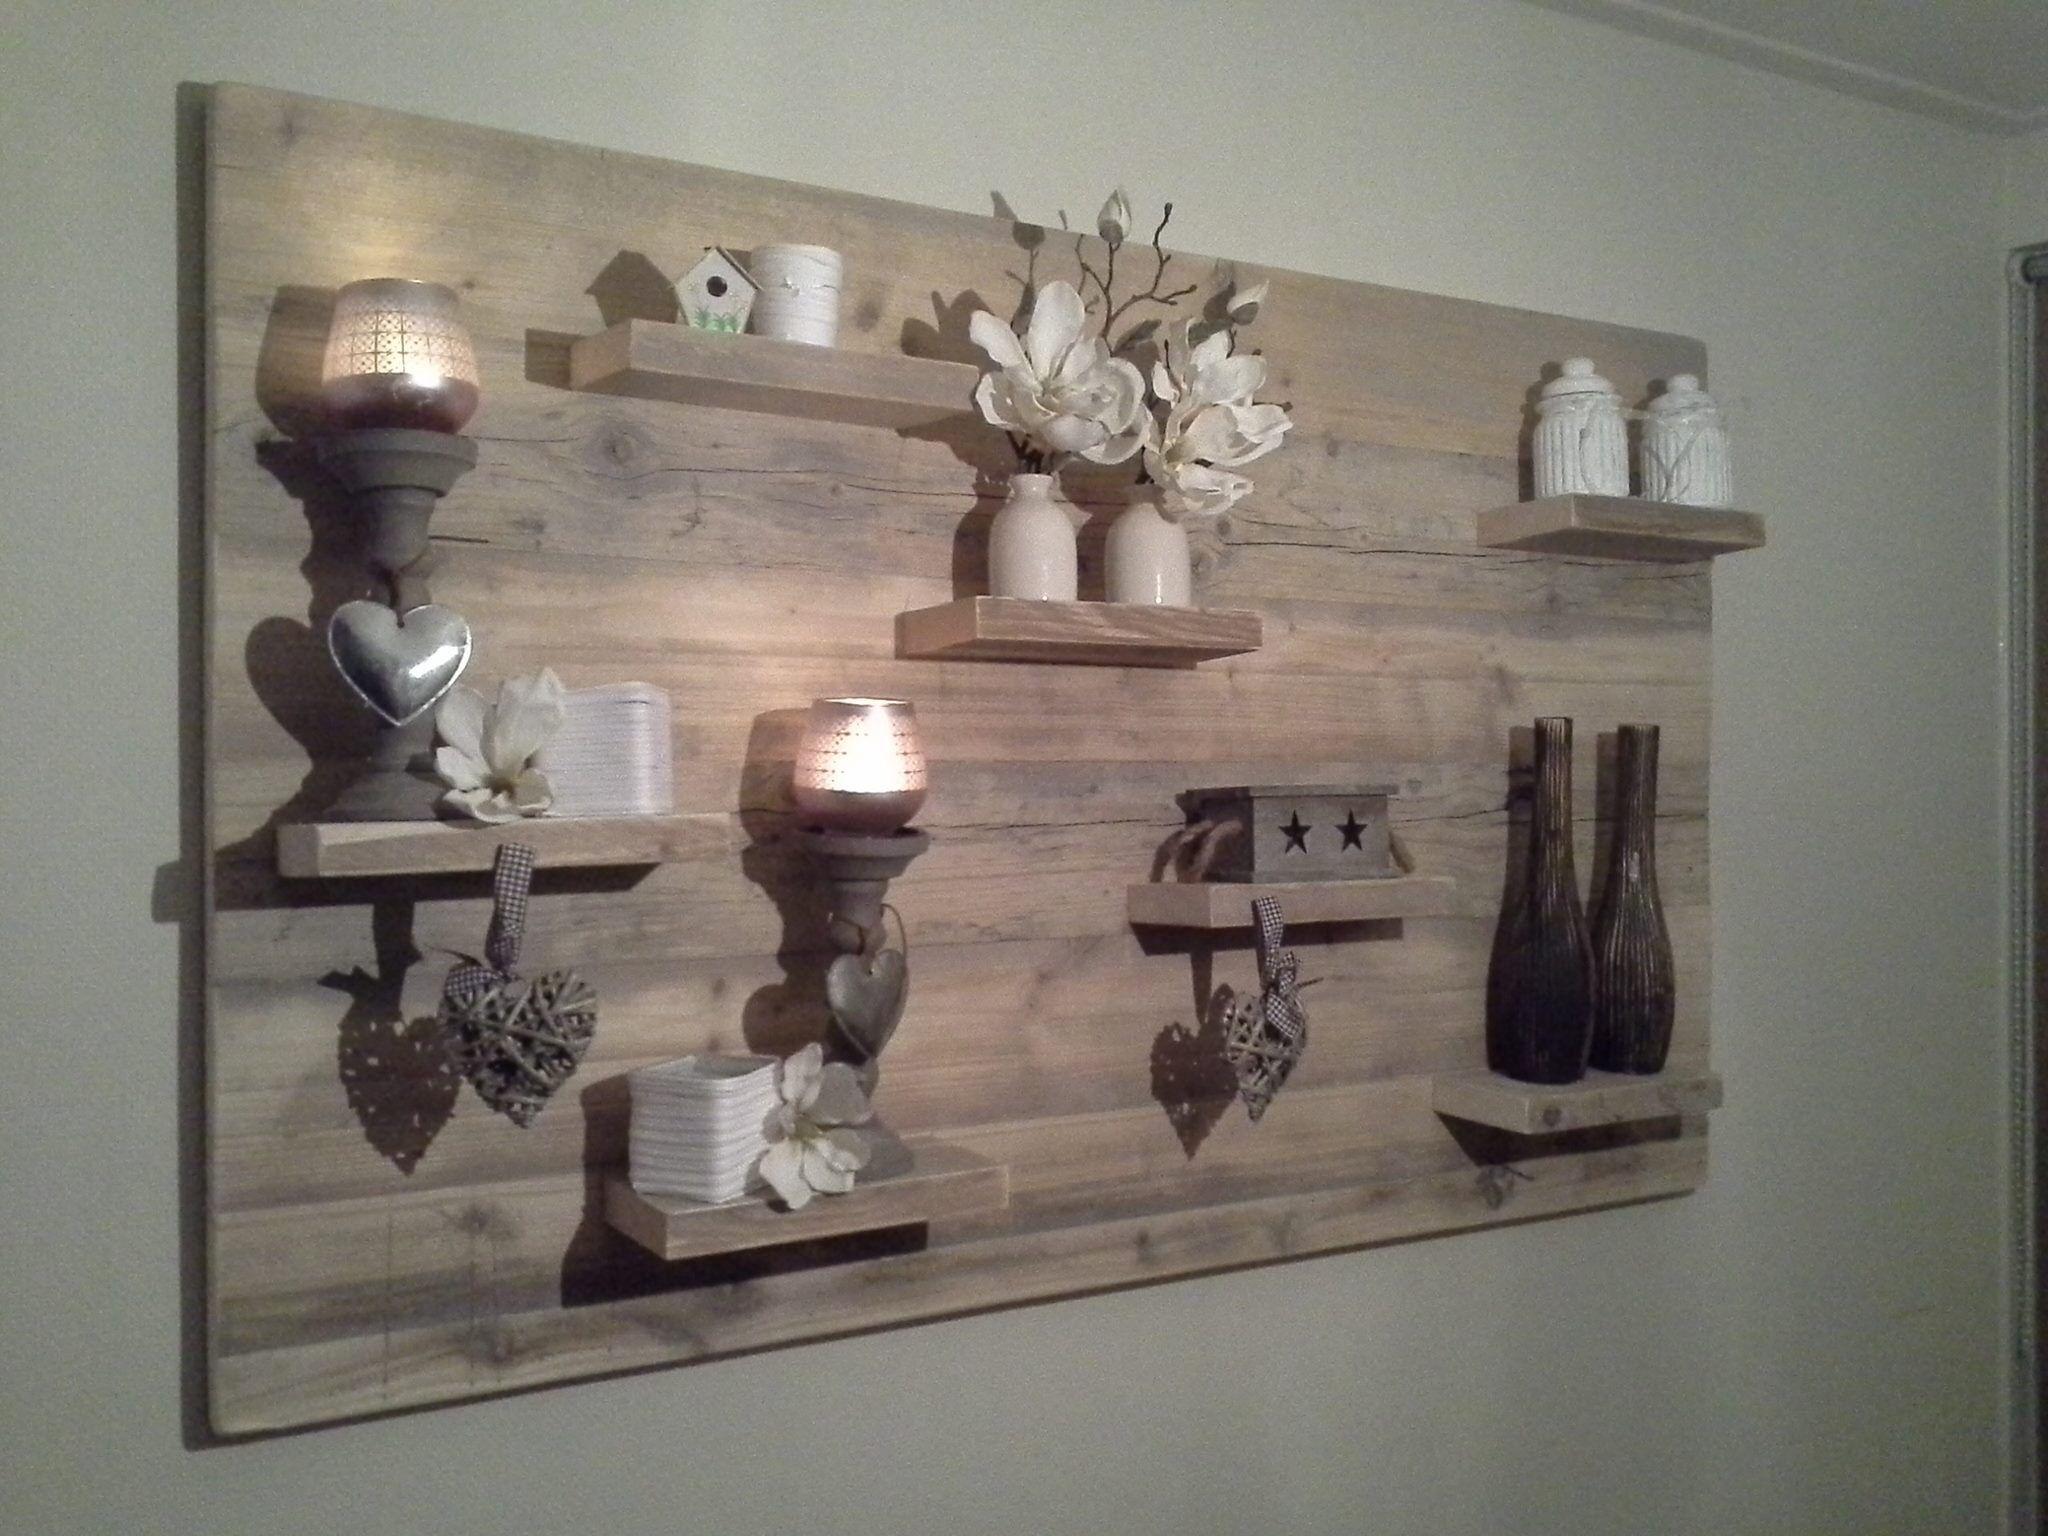 Leuke Slaapkamer Decoraties : Leuke muur decoratie slaapkamer wall decorations